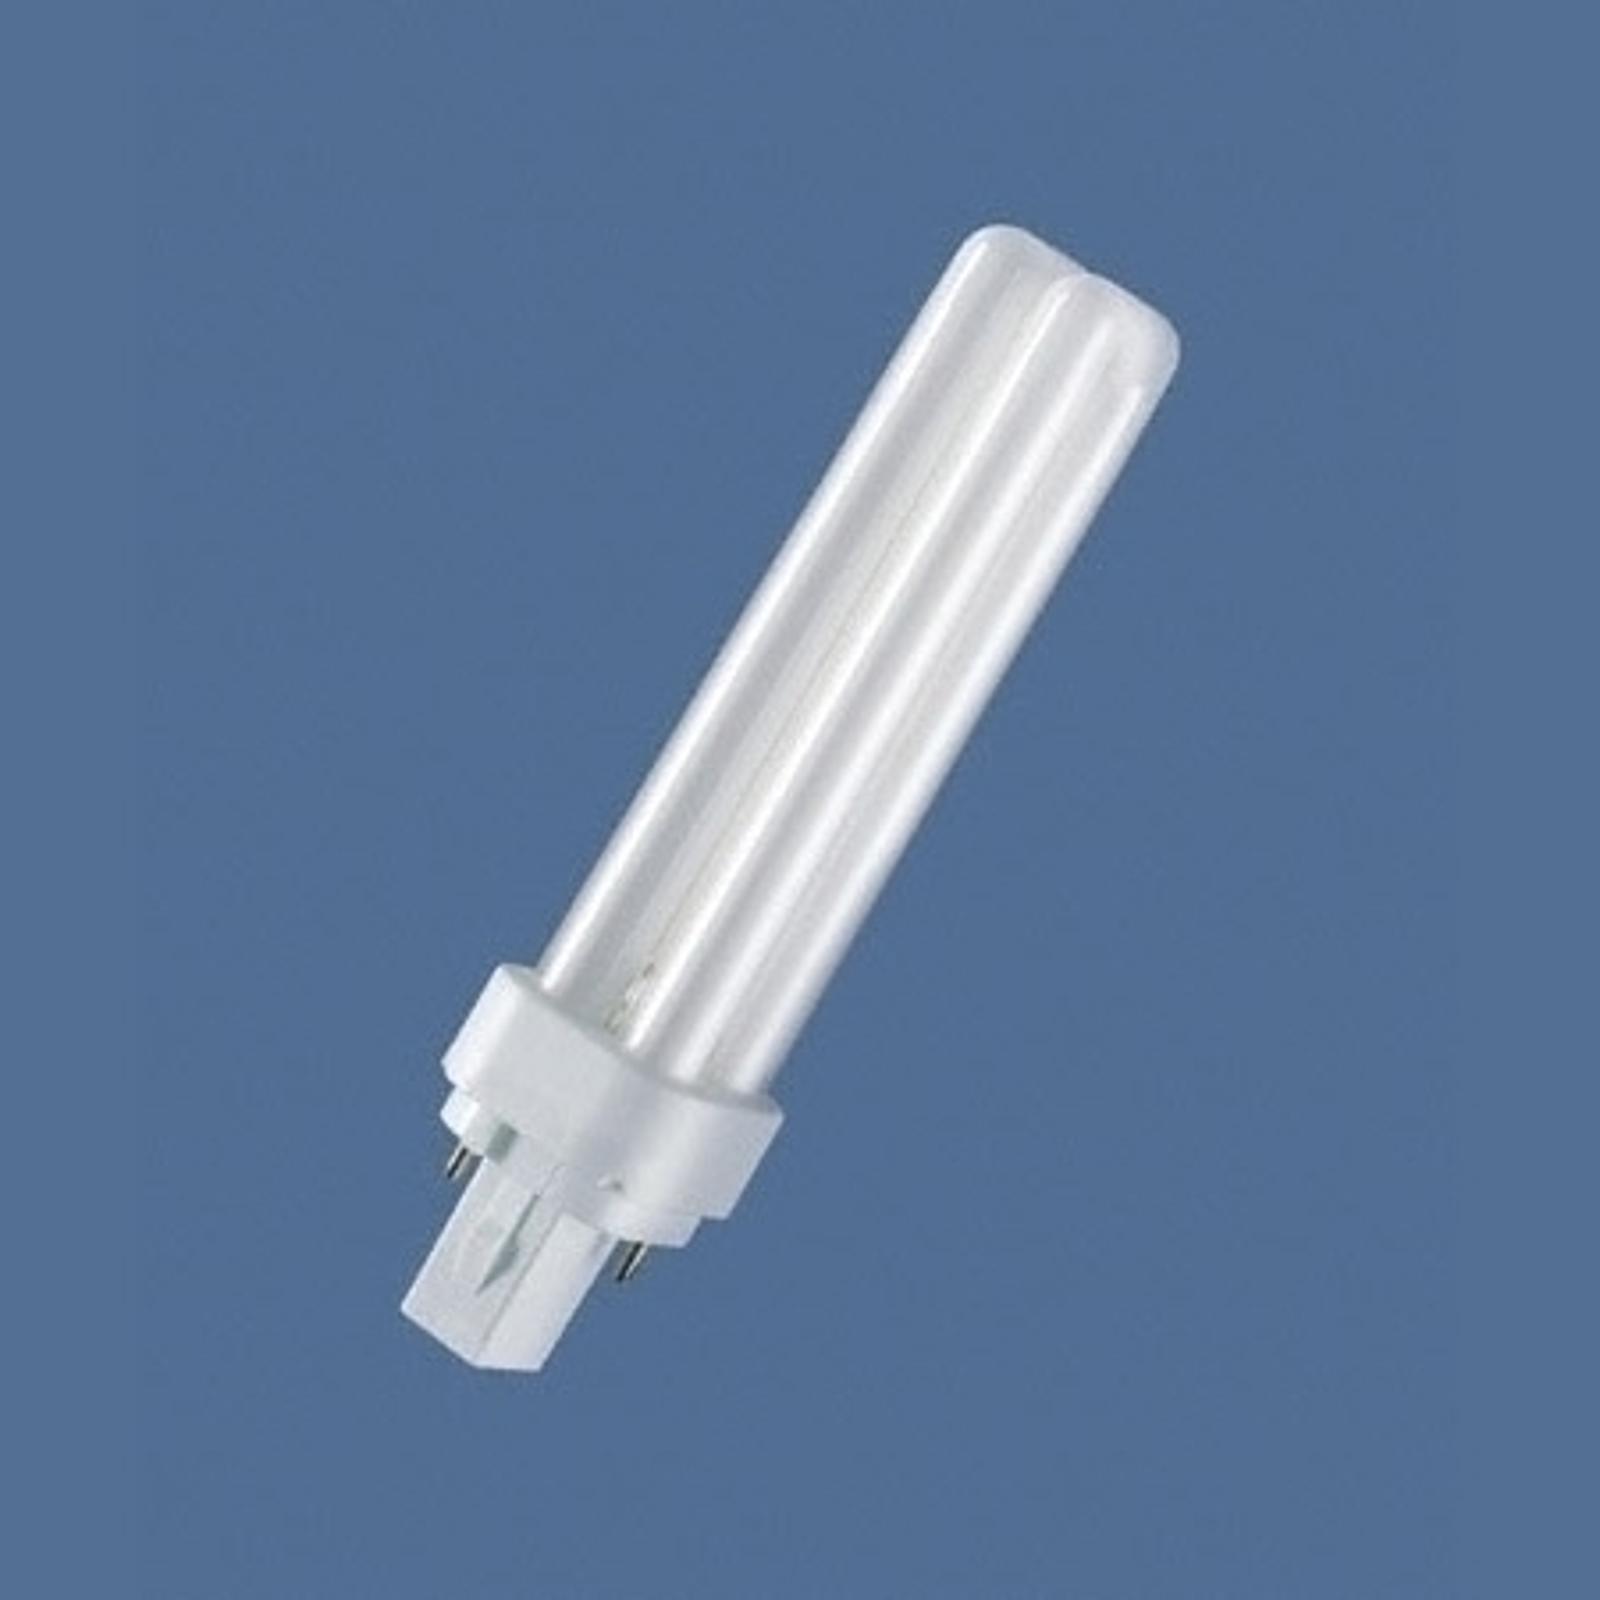 G24d 26W 830 Kompaktleuchtstofflampe Dulux D